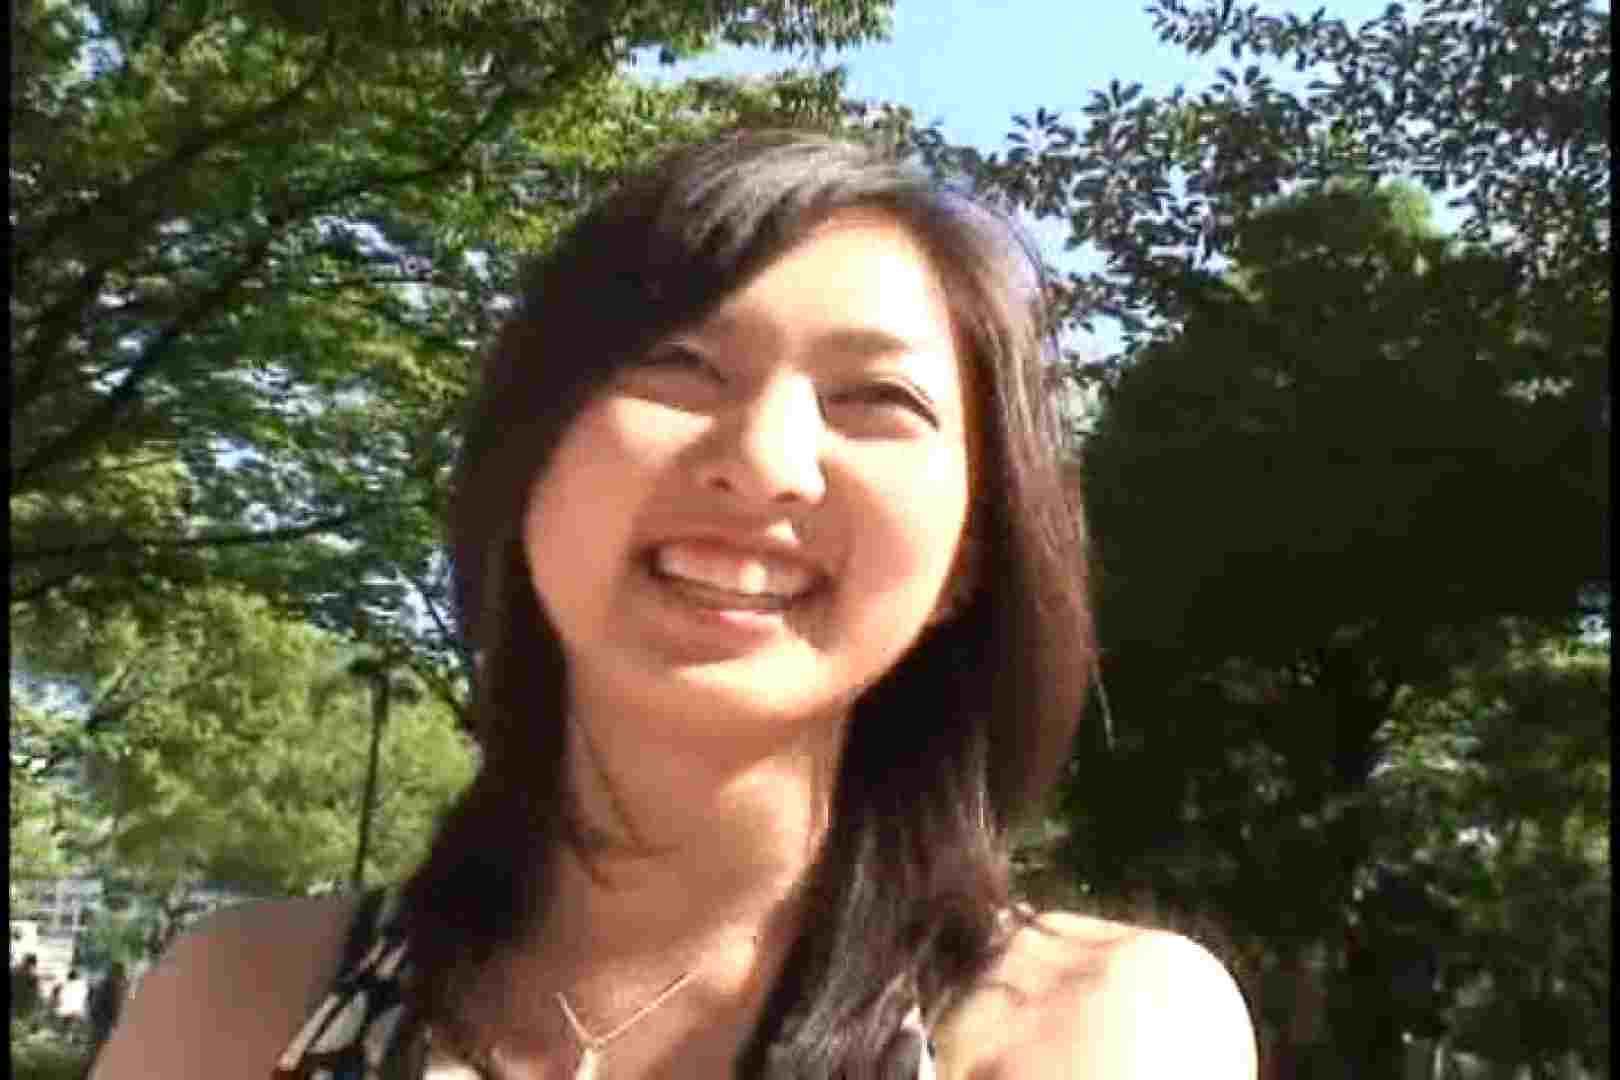 JDハンター全国ツアー vol.004 前編 女子大生  82画像 38